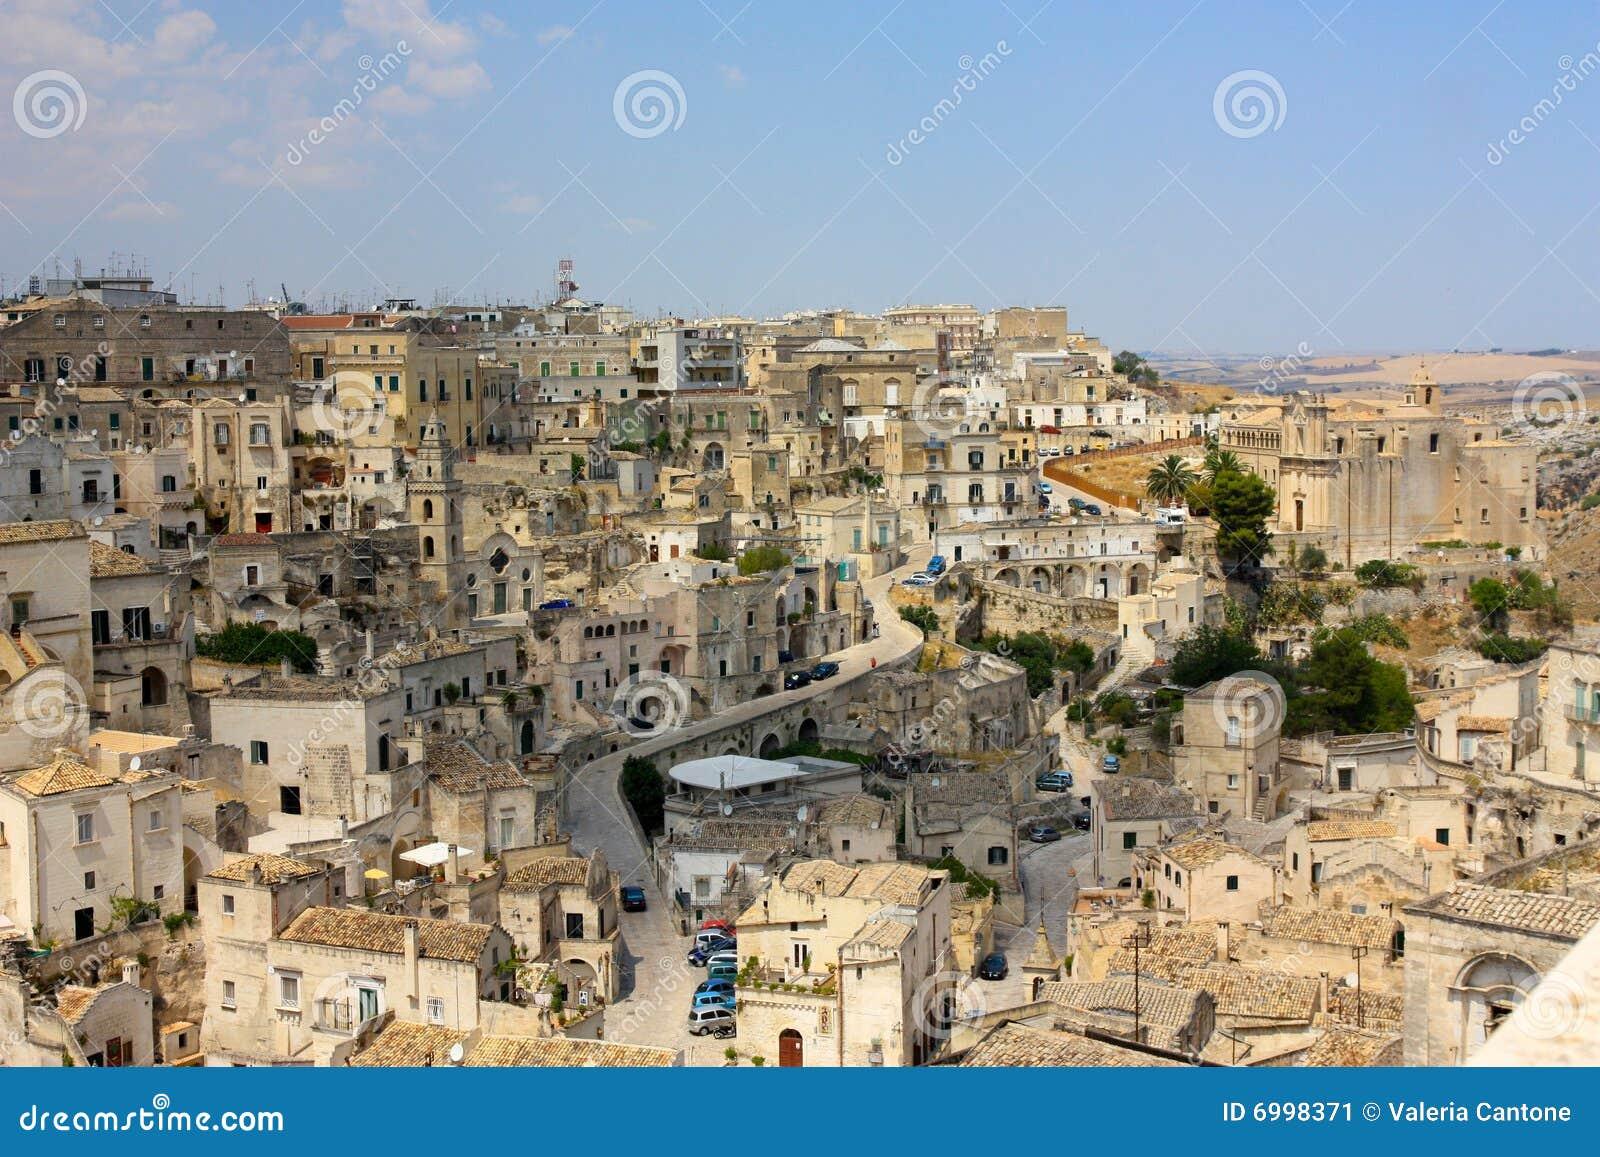 Matera, Basilicata, Italy Stock Image - Image: 6998371